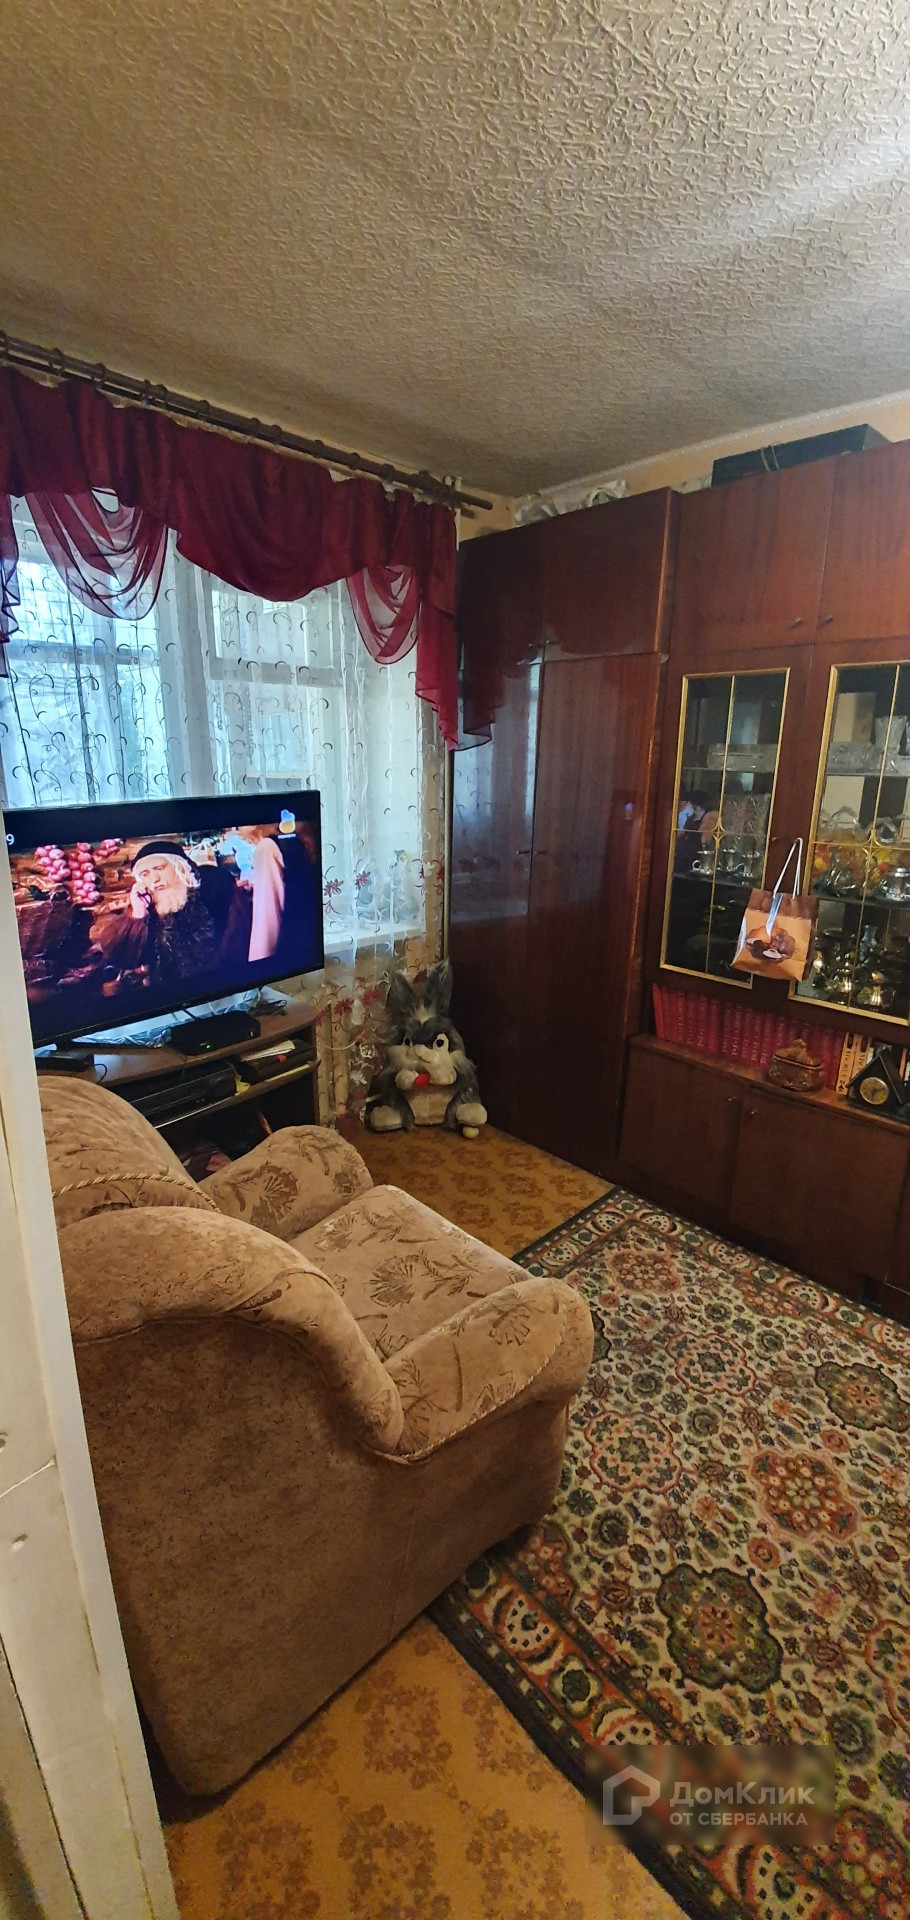 недвижимость в липецке дома с фото солдат